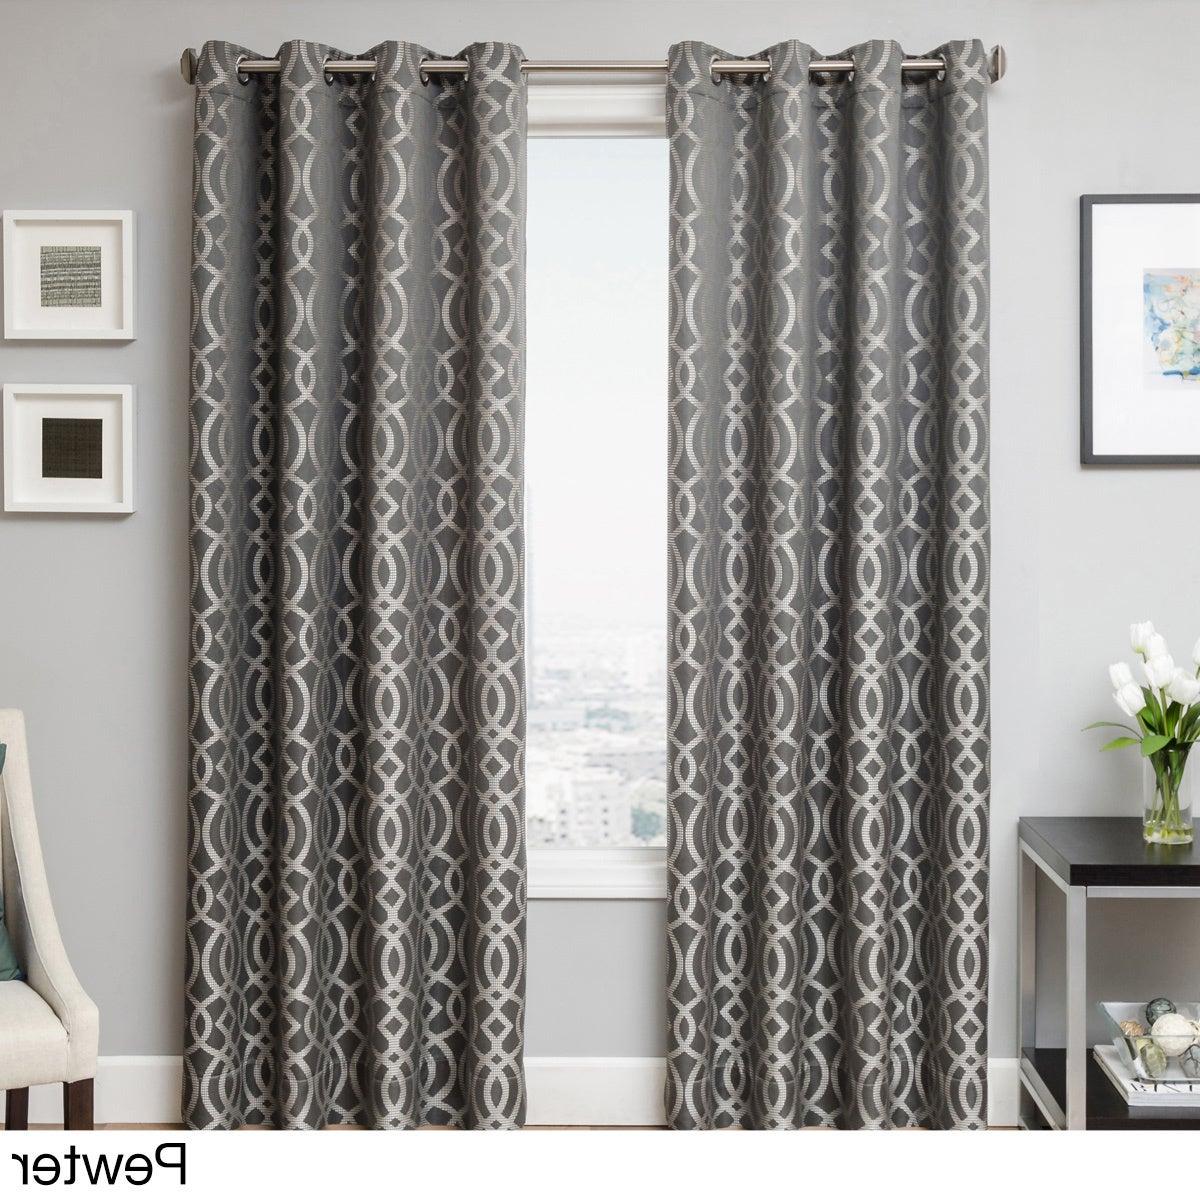 Softline Trenton Grommet Top Curtain Panels For Recent Softline Everest Grommet Top Curtain Panel (View 15 of 20)